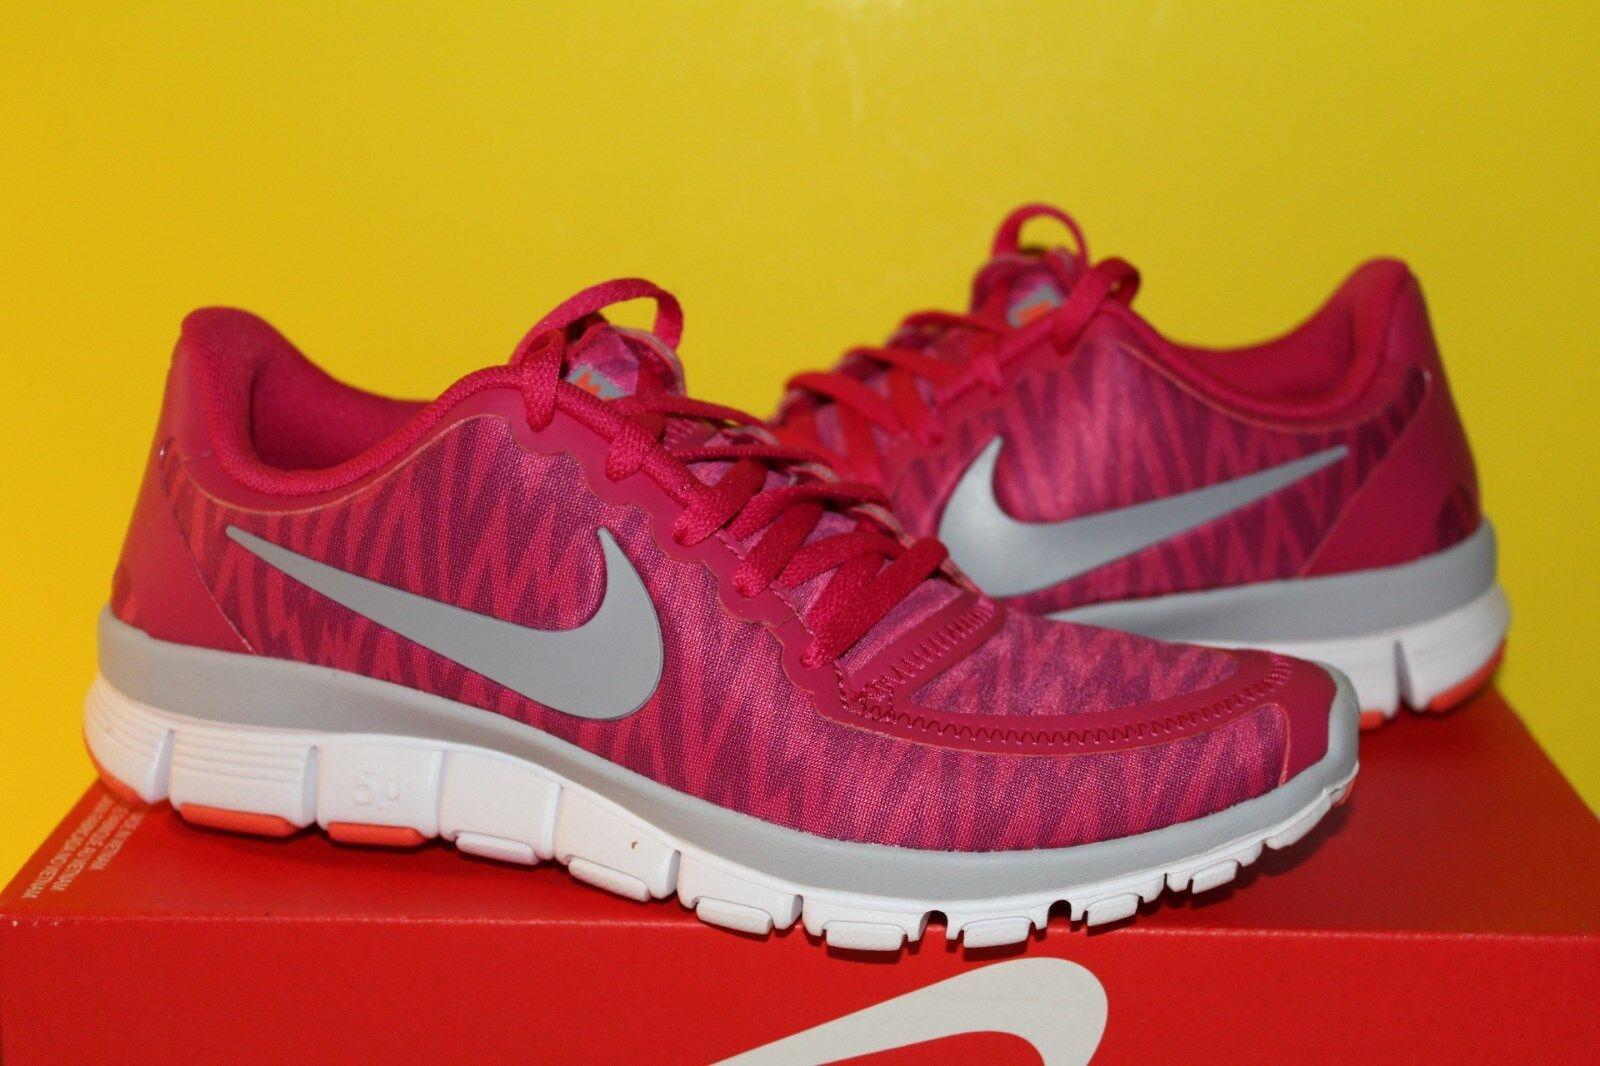 Nike Free 5.0 V4 Women's Running Shoes Comfortable